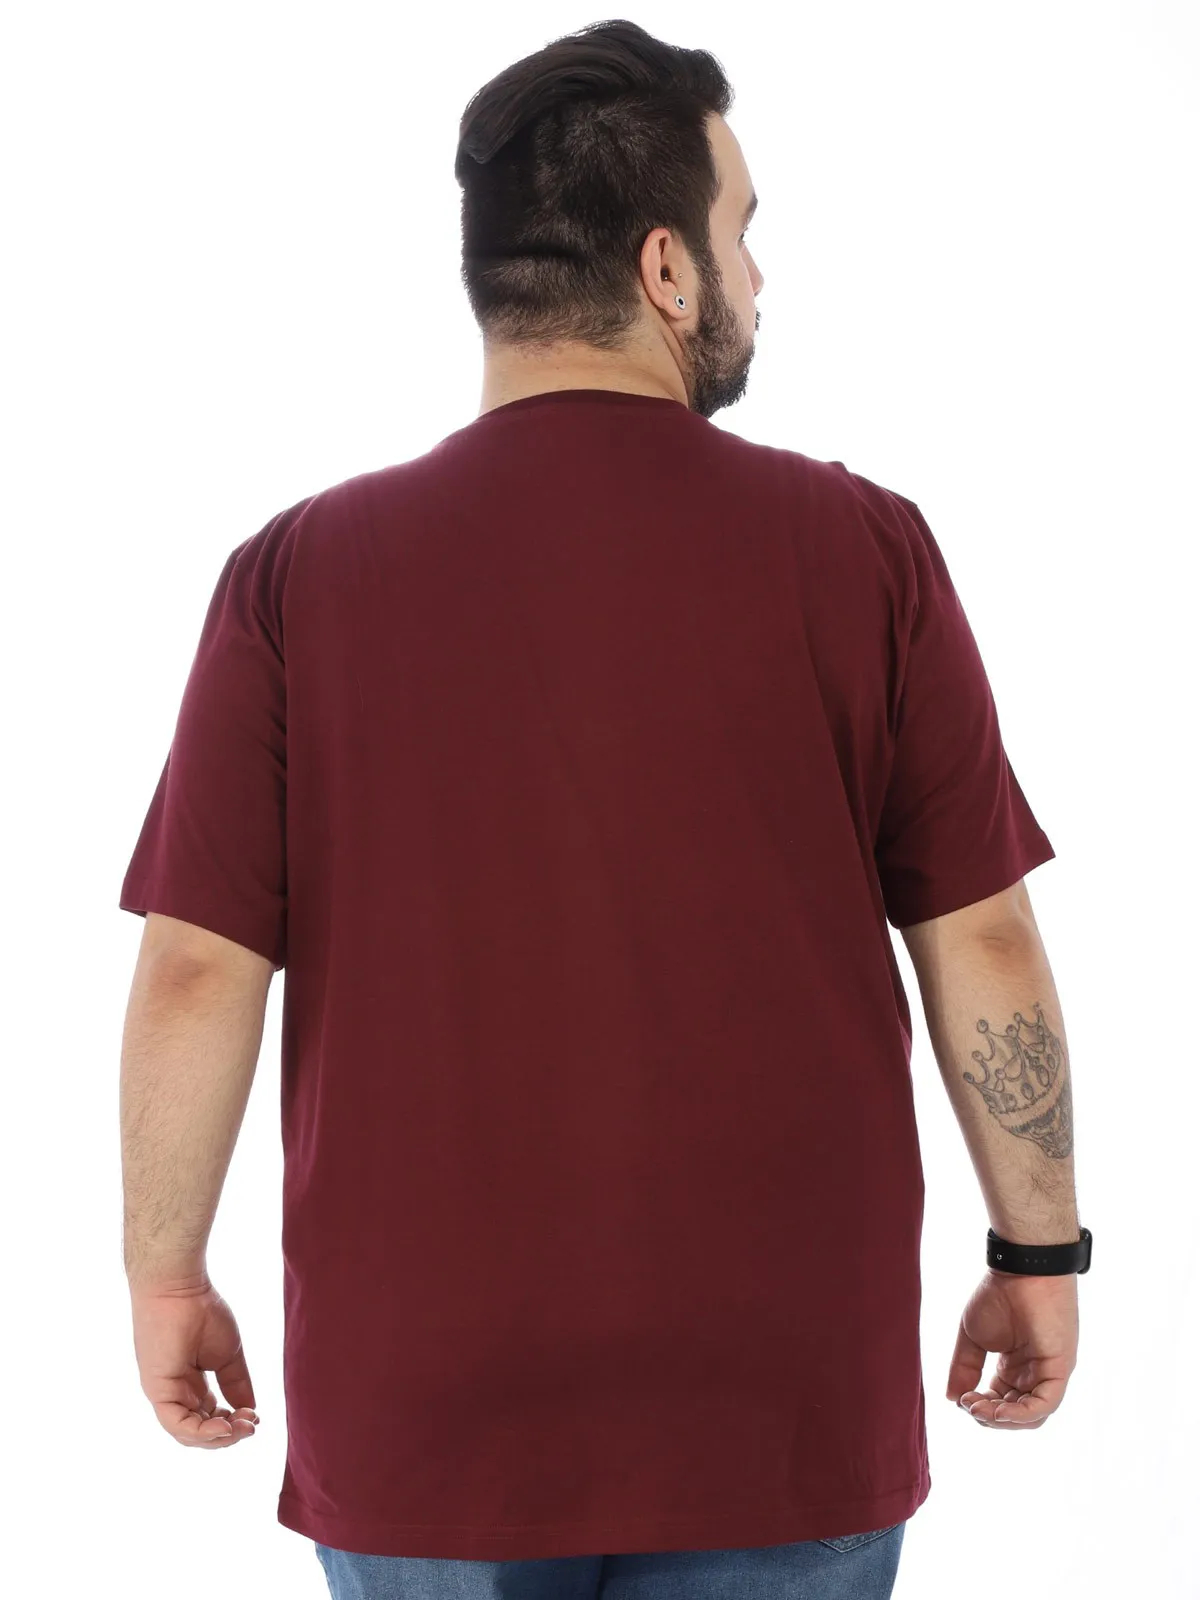 Camiseta Plus Size Masculino Manga Curta Estampada Bordo